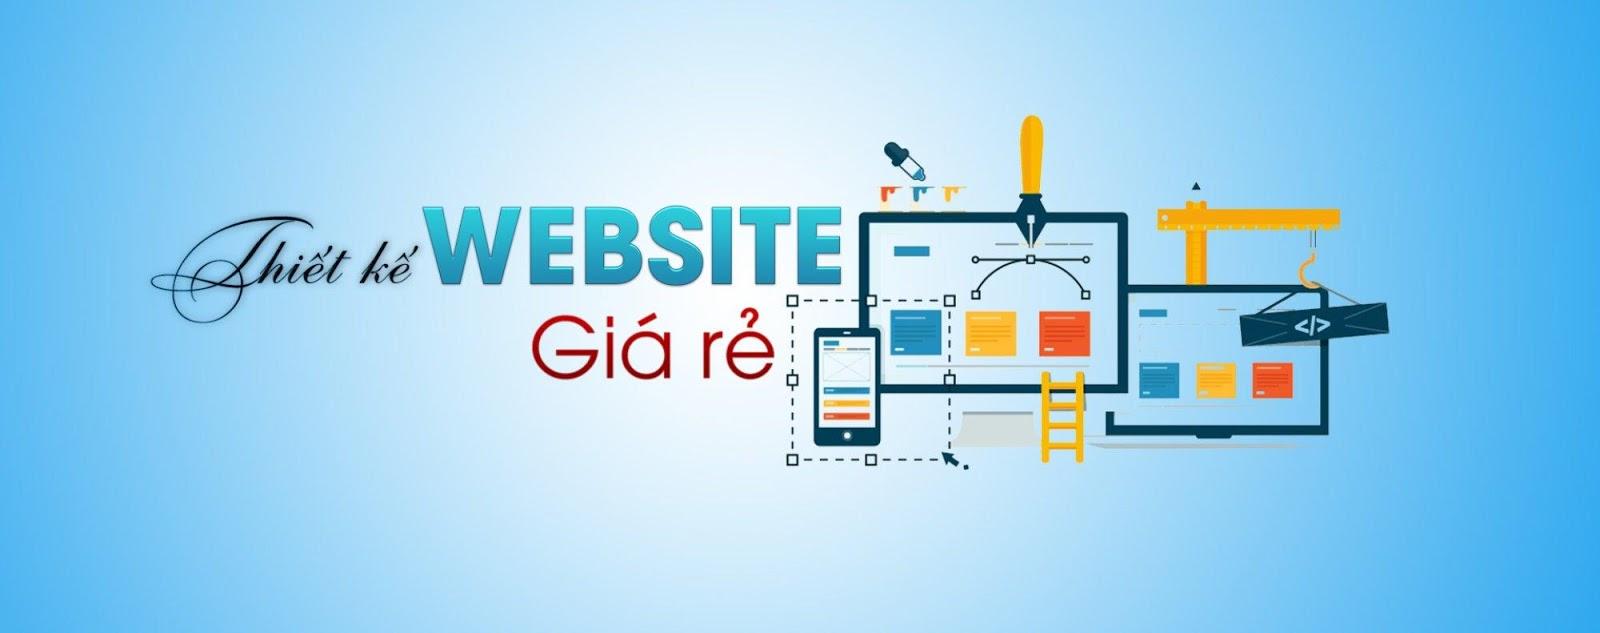 thiết kế website rẻ